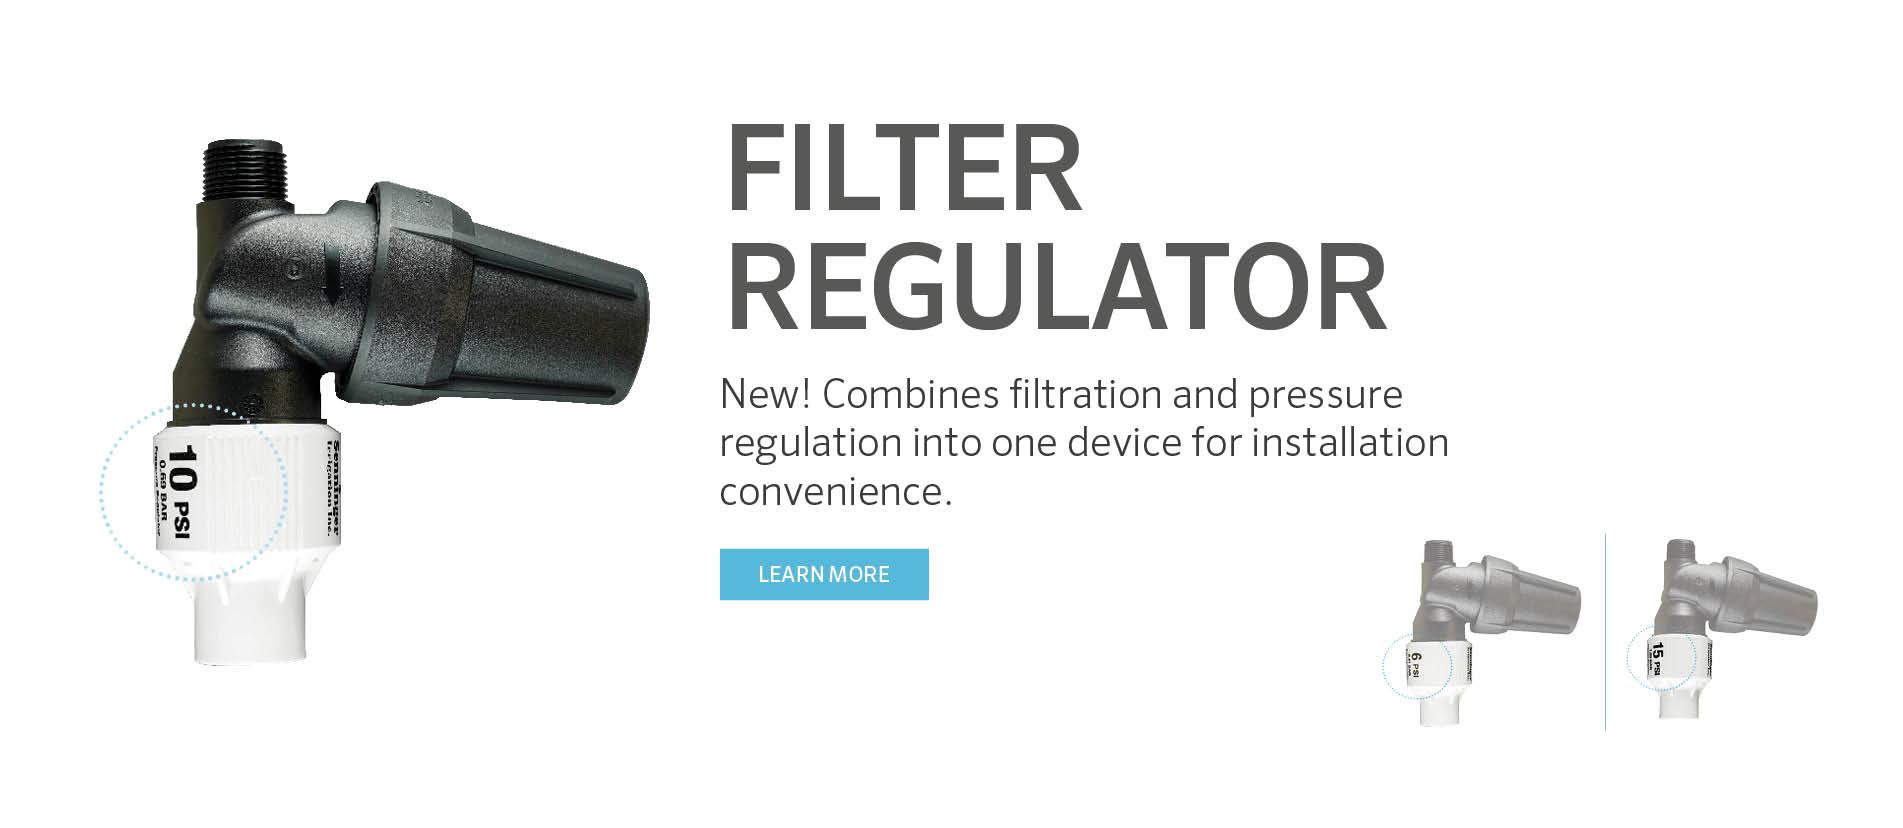 Filter Regulator combines filtration and pressure regulation into one device